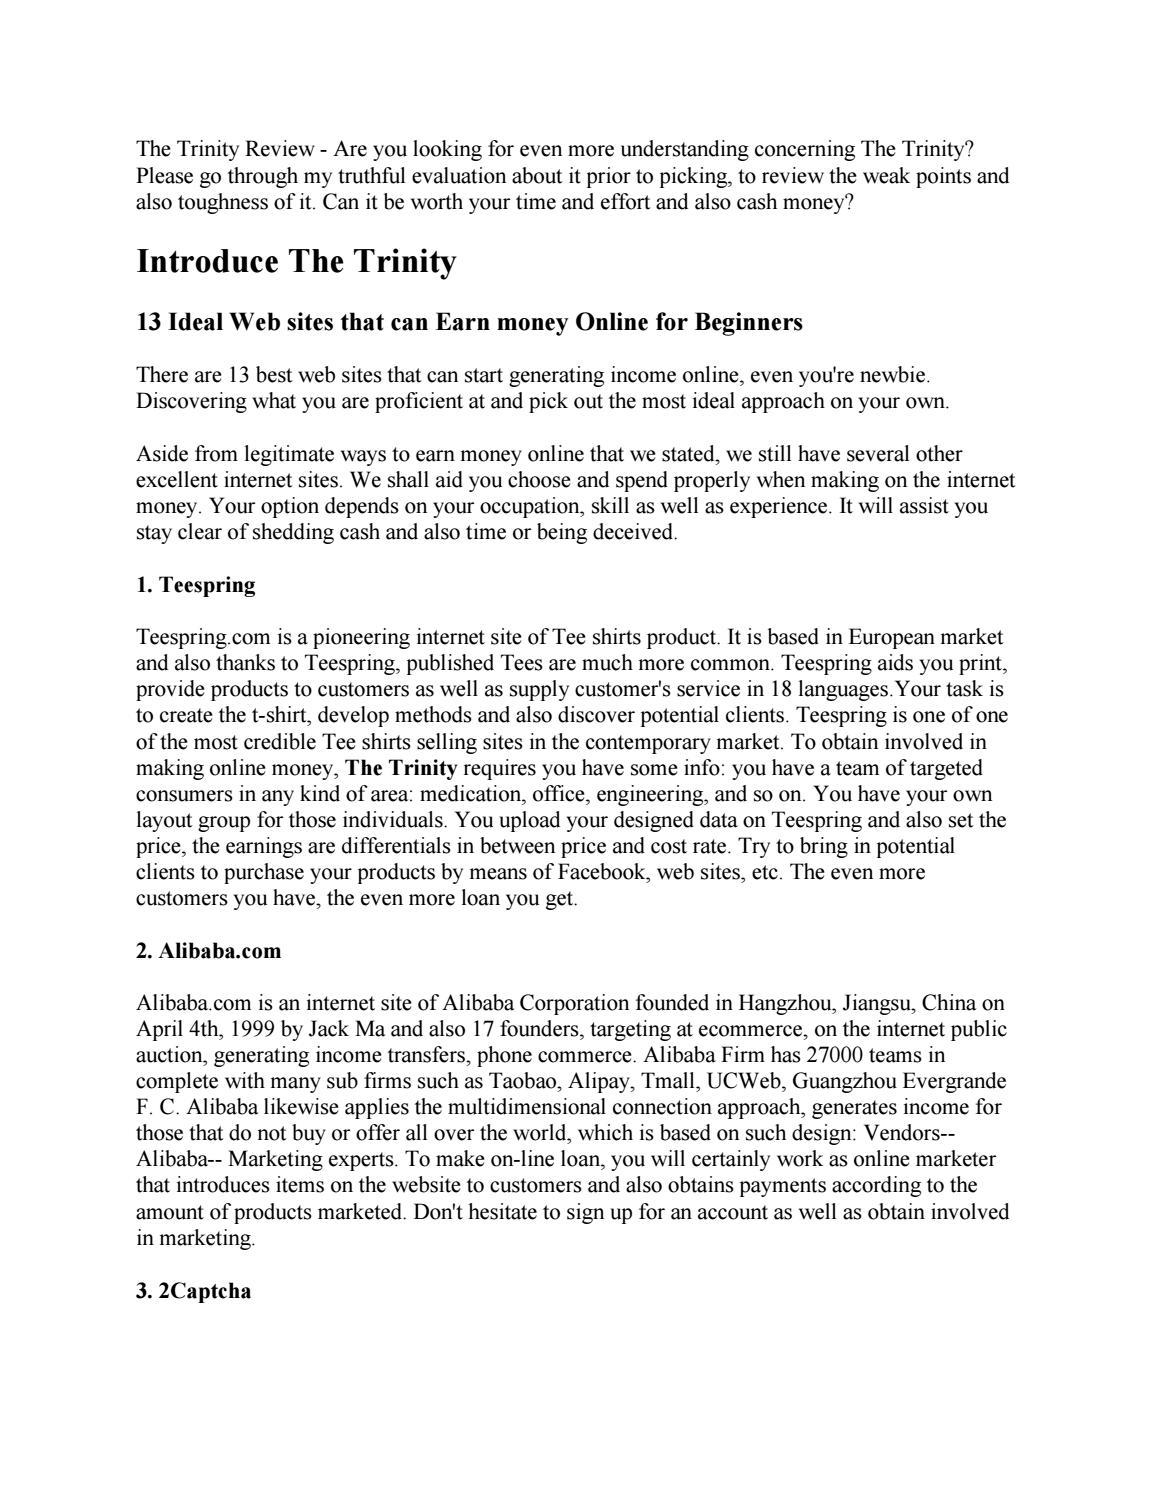 The Trinity Review should we grab it by richardlarue - issuu